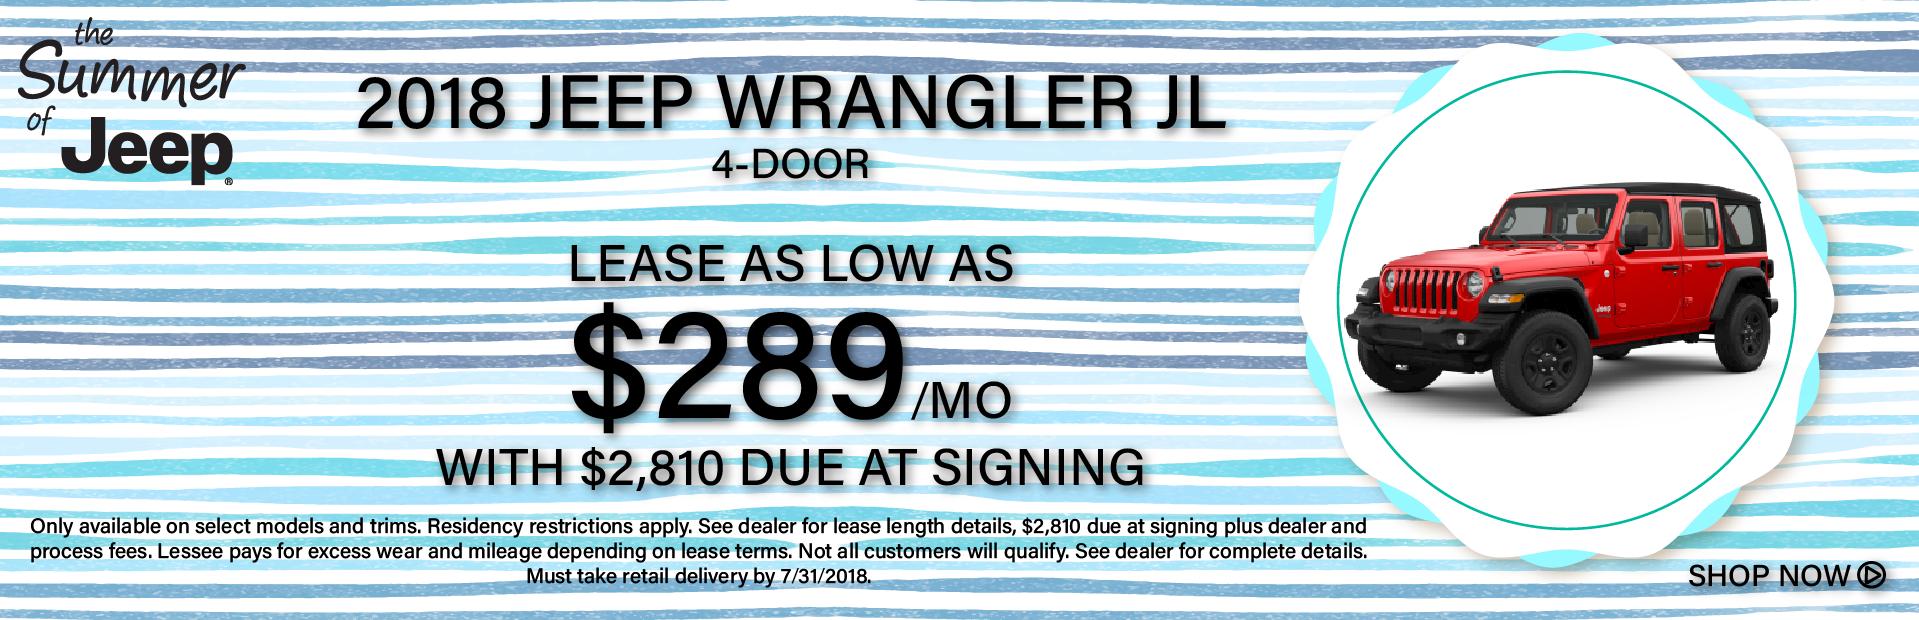 York Chrysler Dodge Jeep Ram FIAT   Auto Dealer in Crawfordsville,